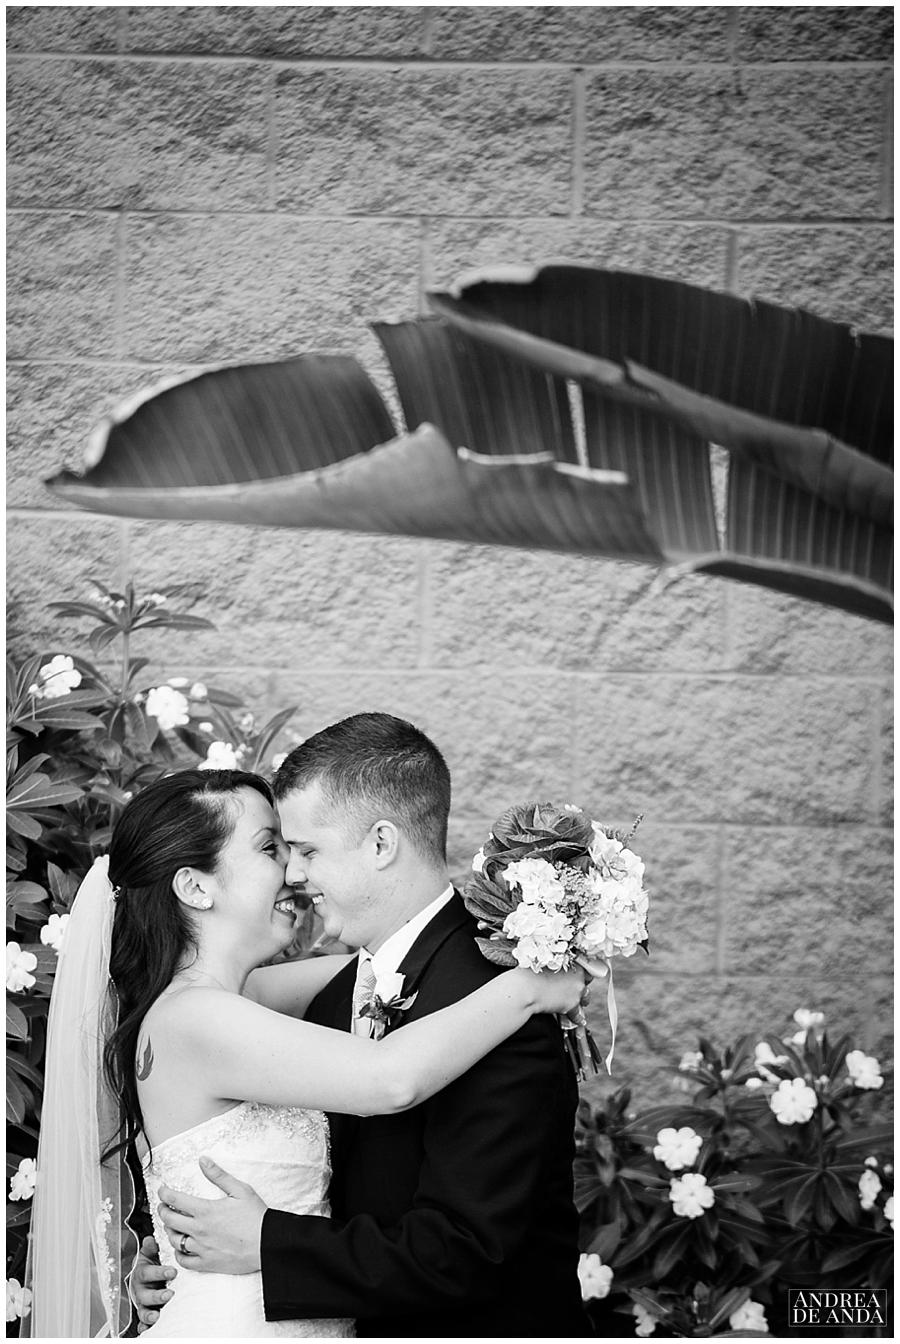 Radisson_Central Coast Wedding Photography-68.jpg